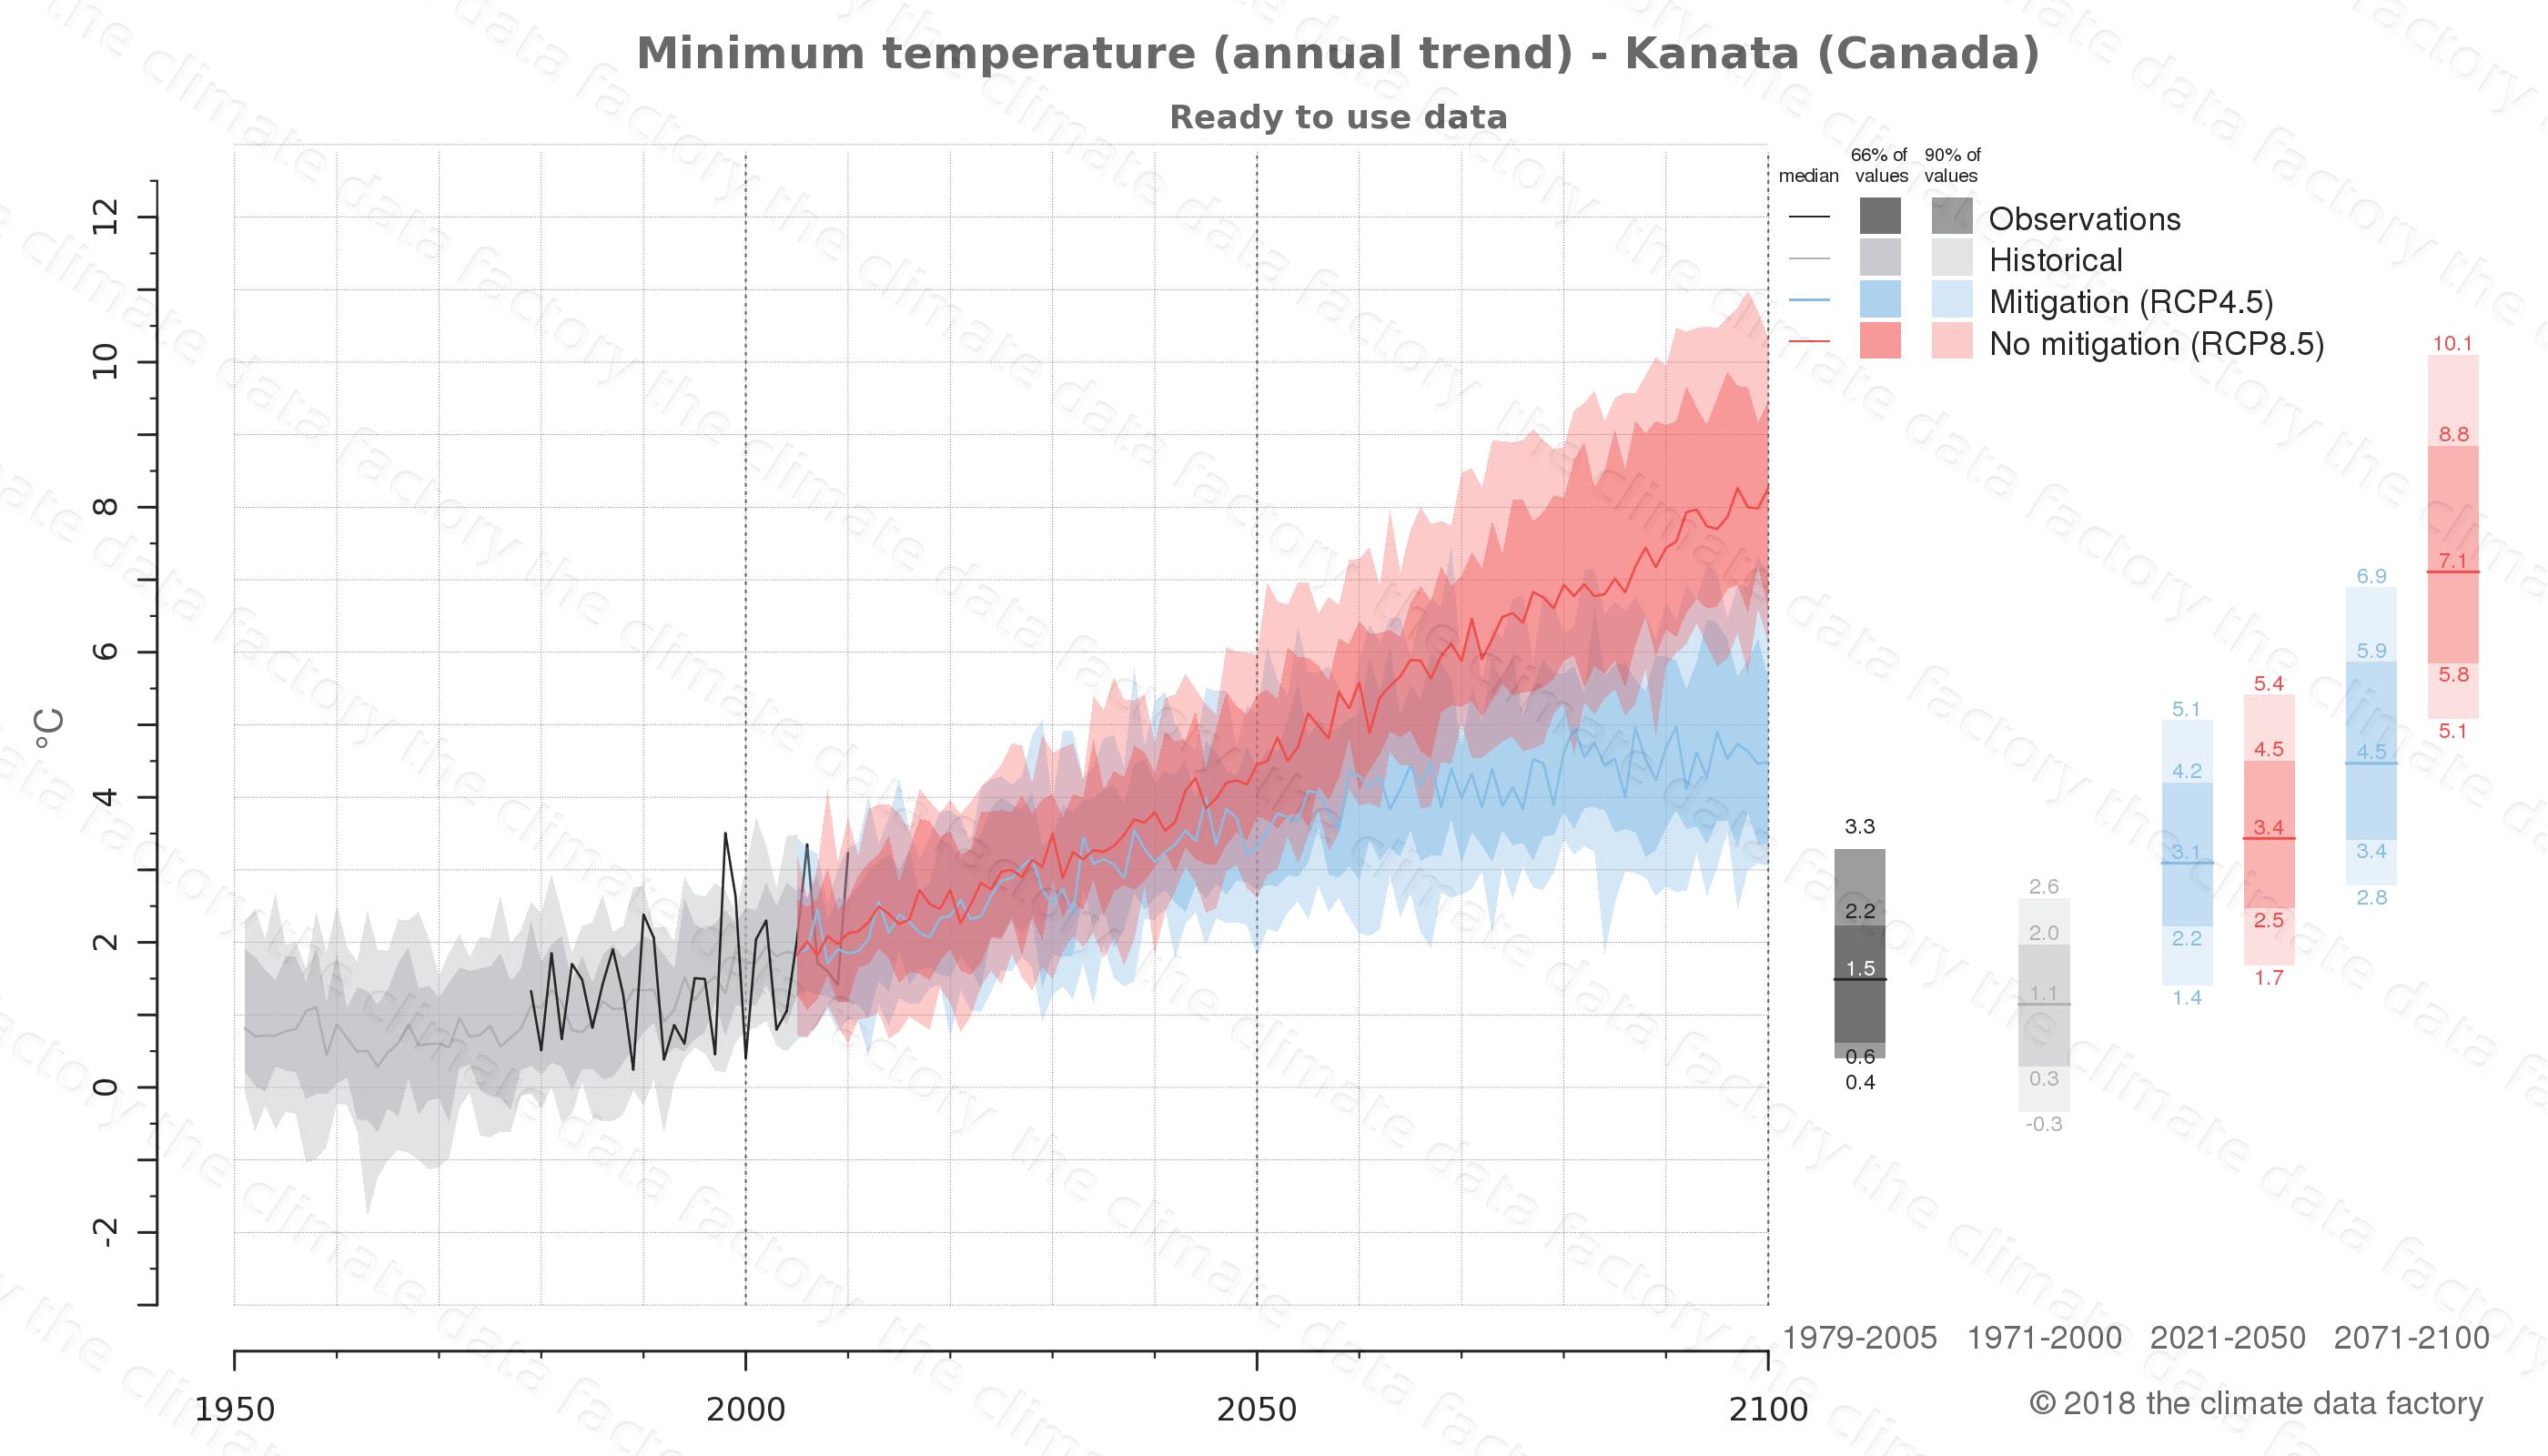 climate change data policy adaptation climate graph city data minimum-temperature kanata canada